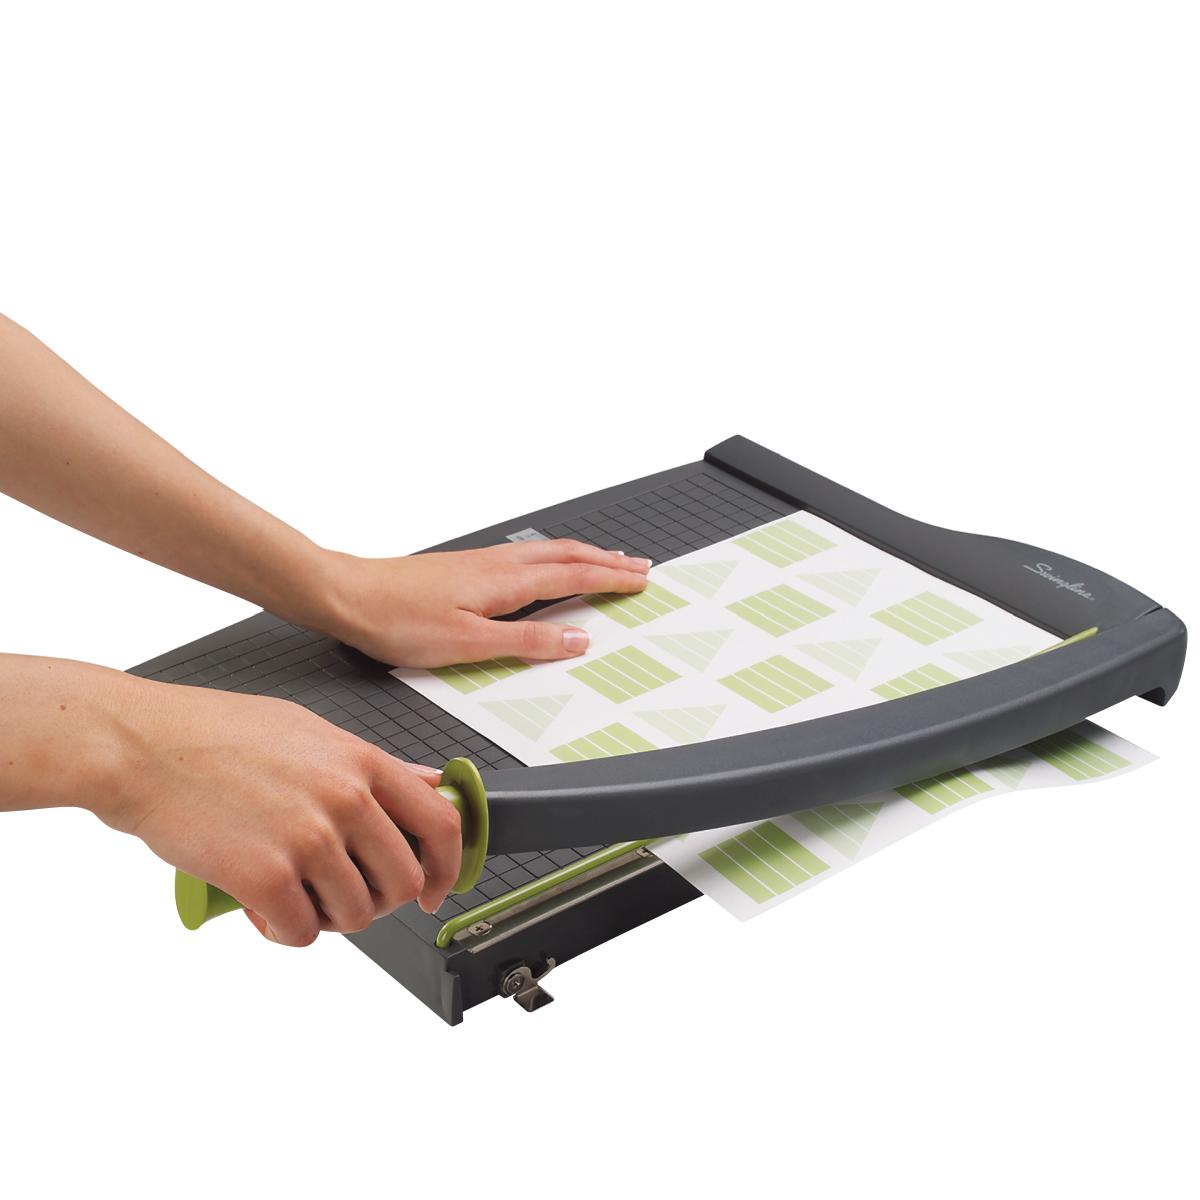 guillotine paper trimmer Description & features+ swingline 93121 guillotine paper trimmer - cuts 10  sheet - 305mm cutting length - plastic, steel blade - gray.